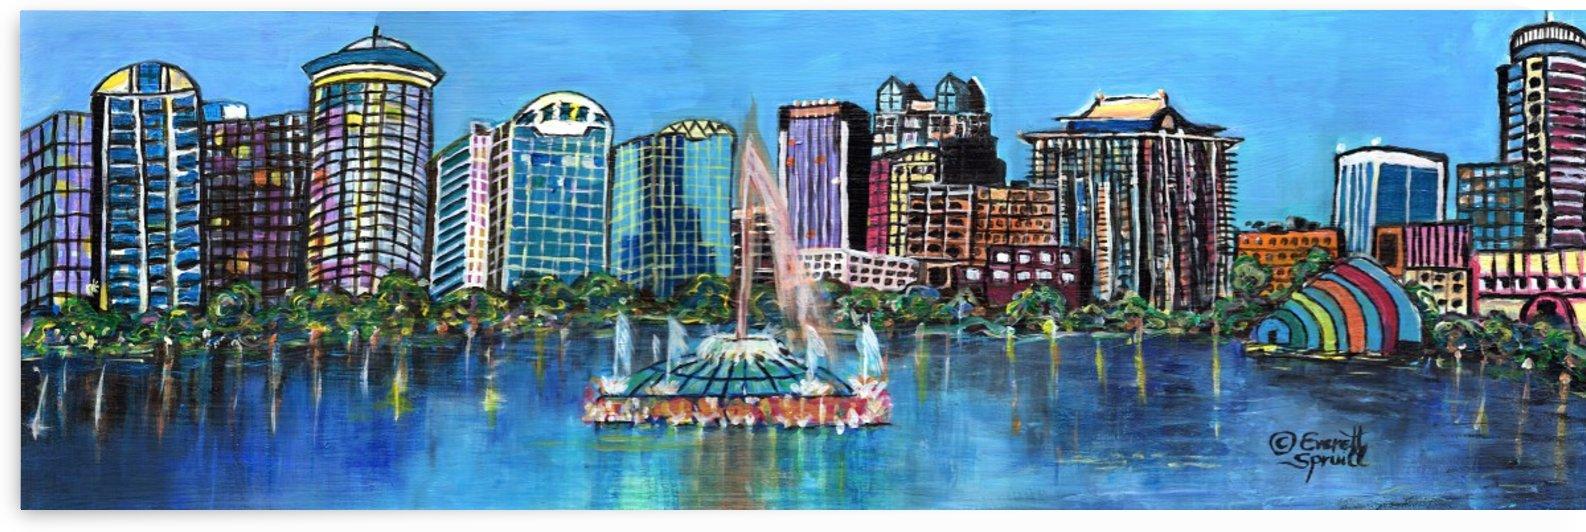 Lake Eola Fountain and Orlando Skyline by Everett Spruill